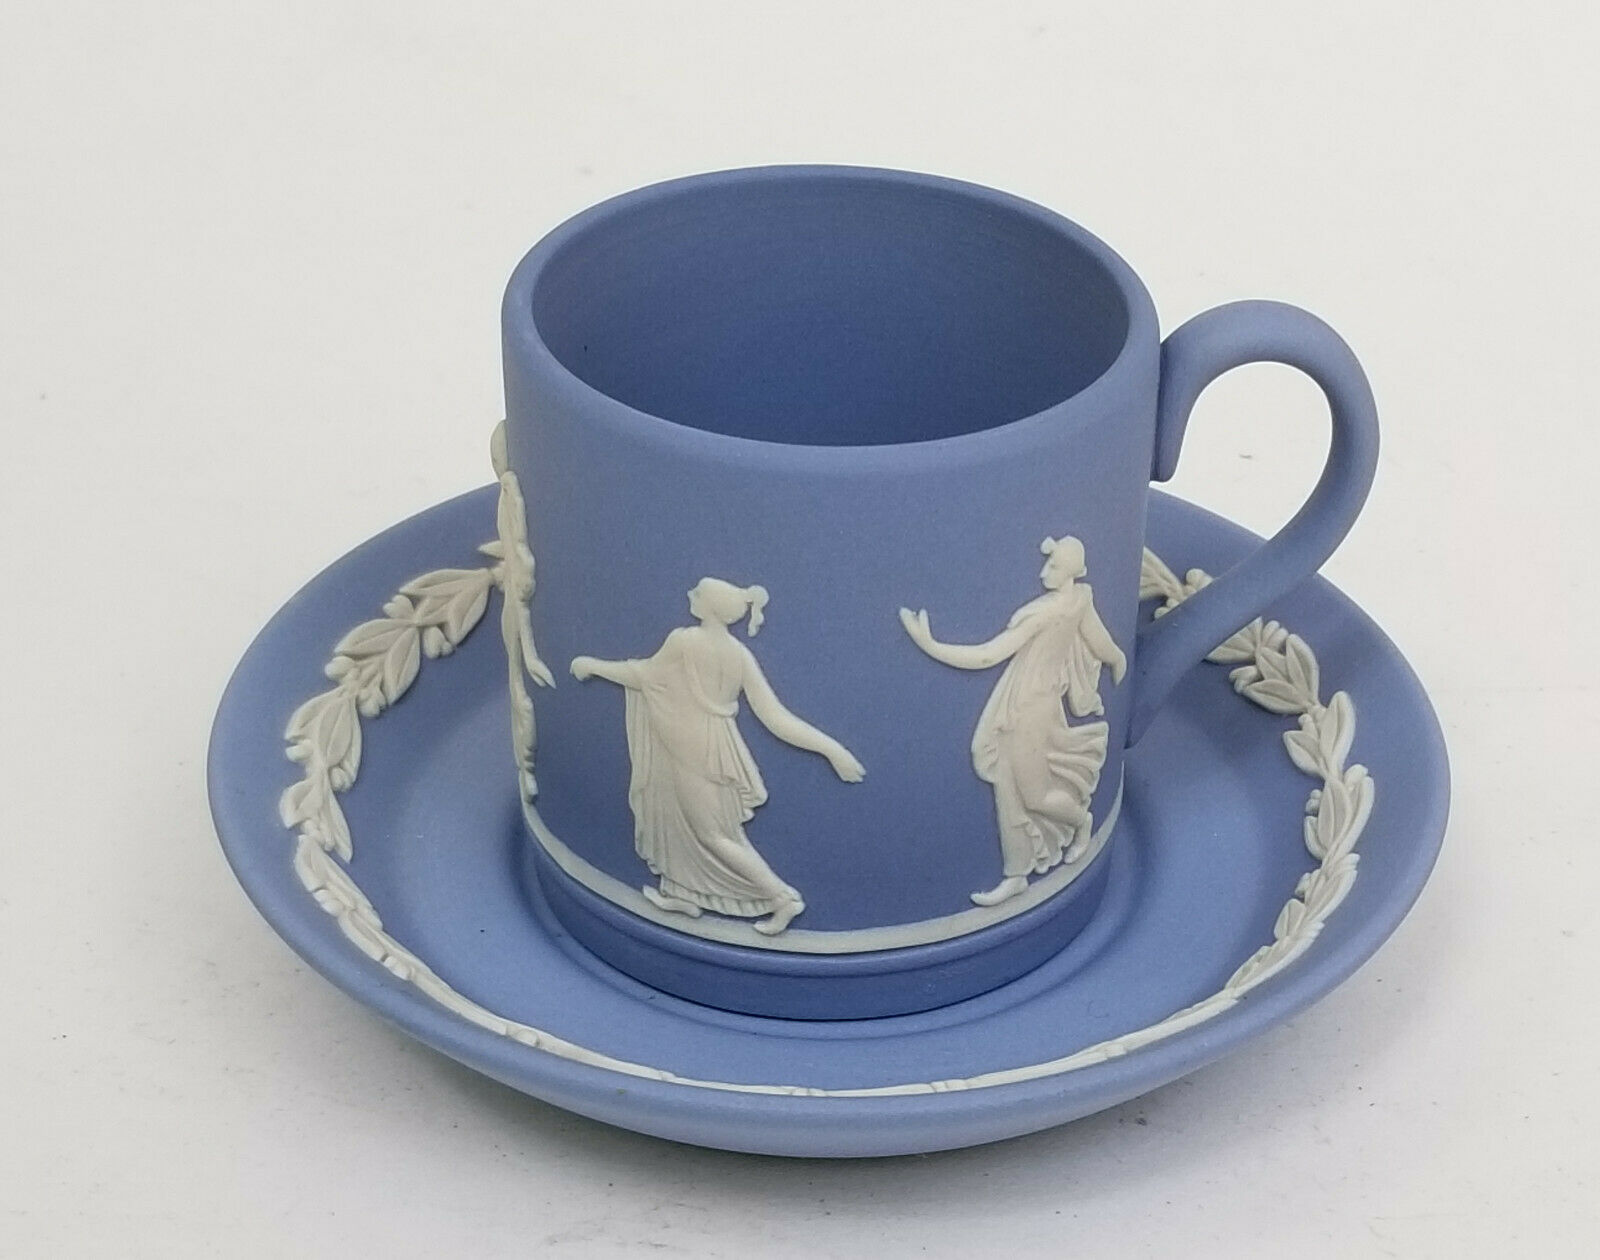 Antique Wedgwood Demitasse Cup /& Saucer Powder Blue